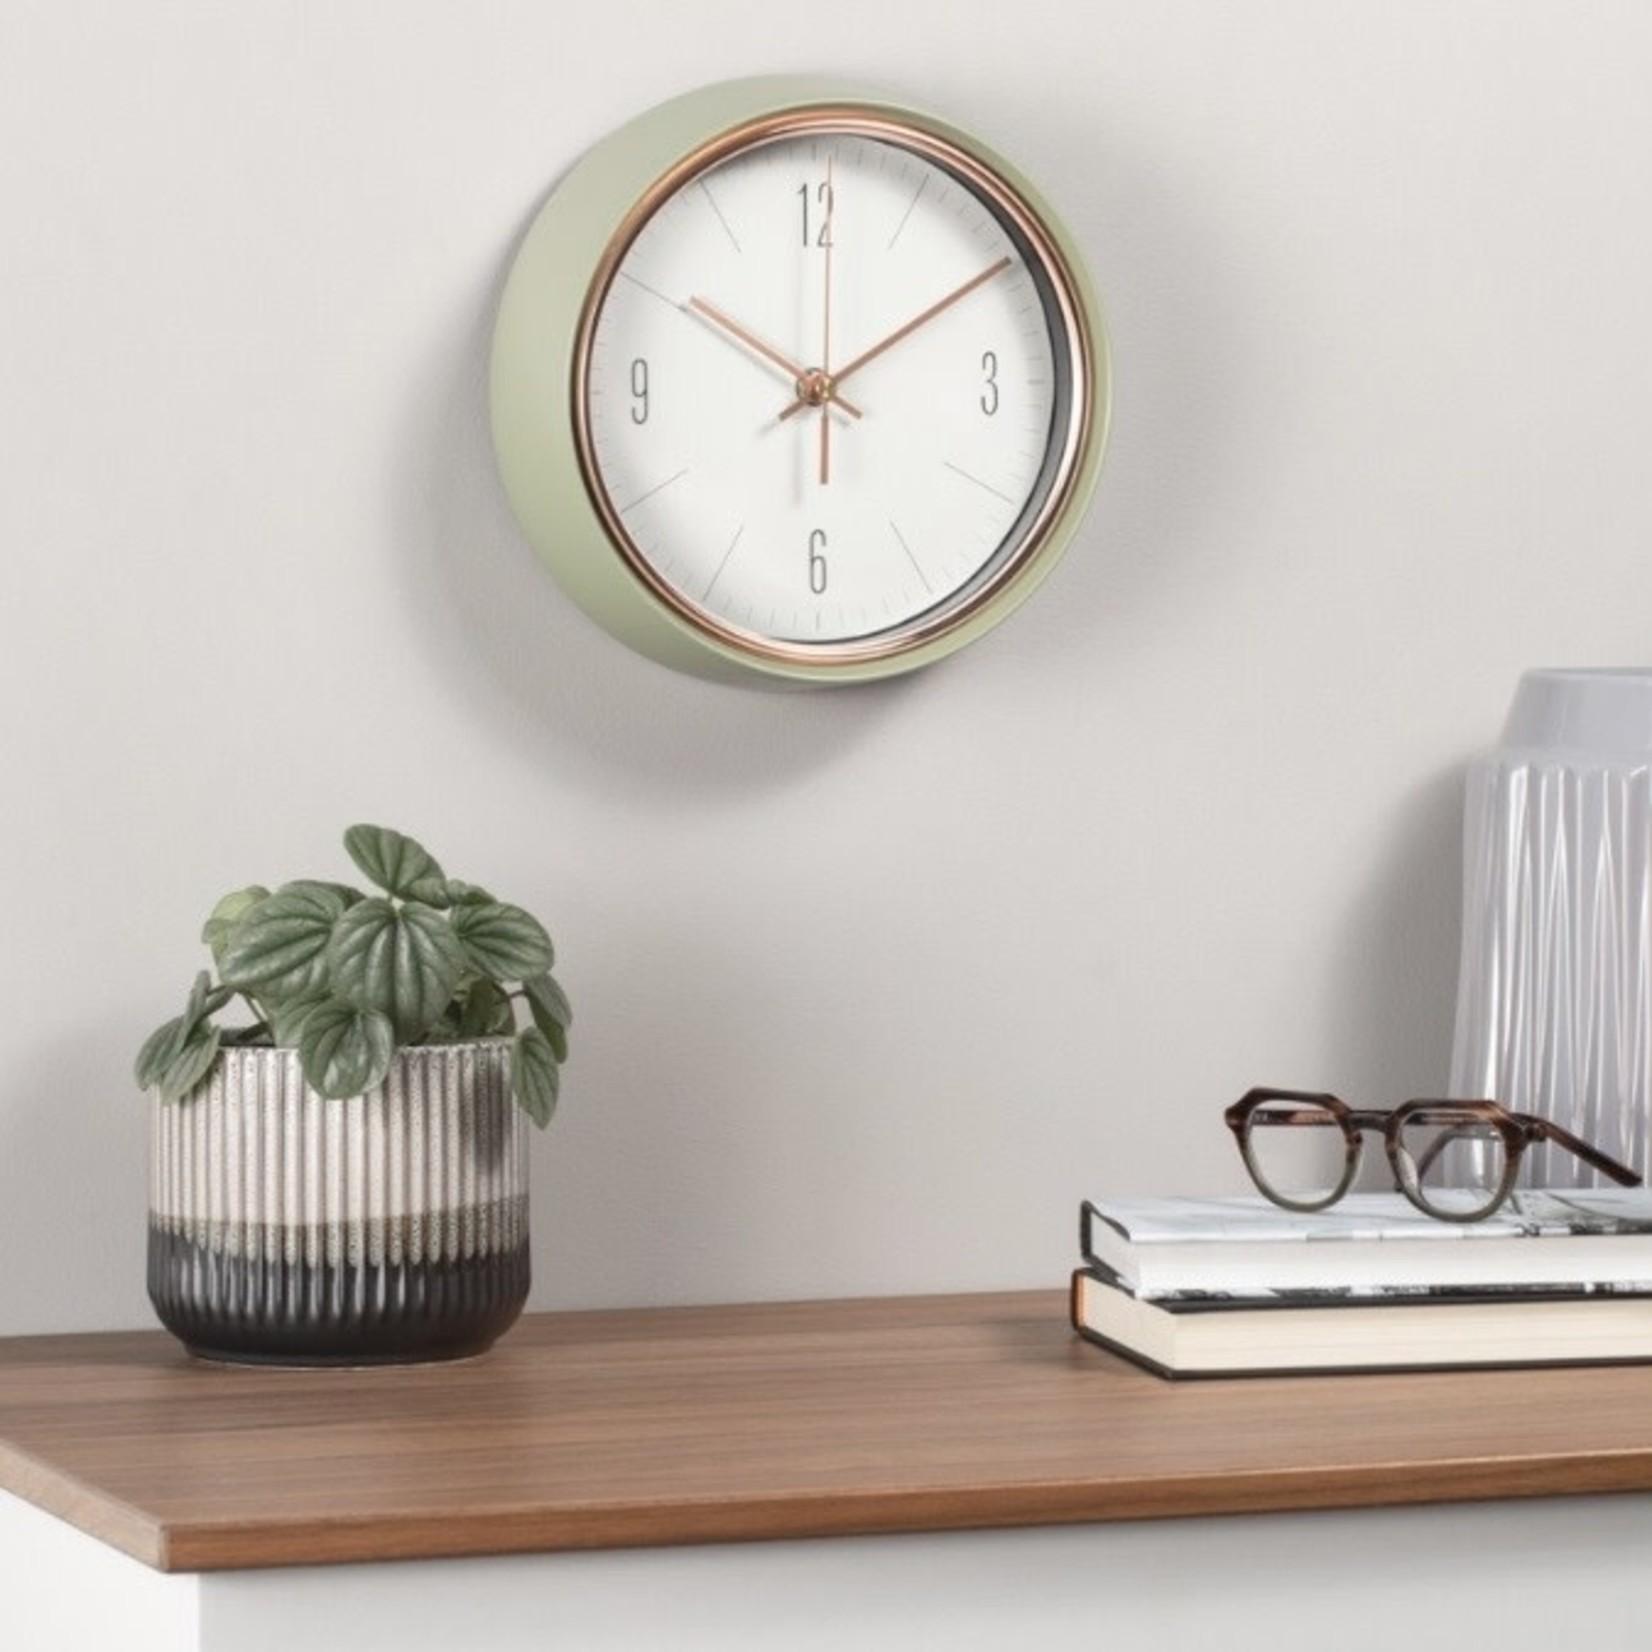 Torre & Tagus Oliver Retro Green Clock